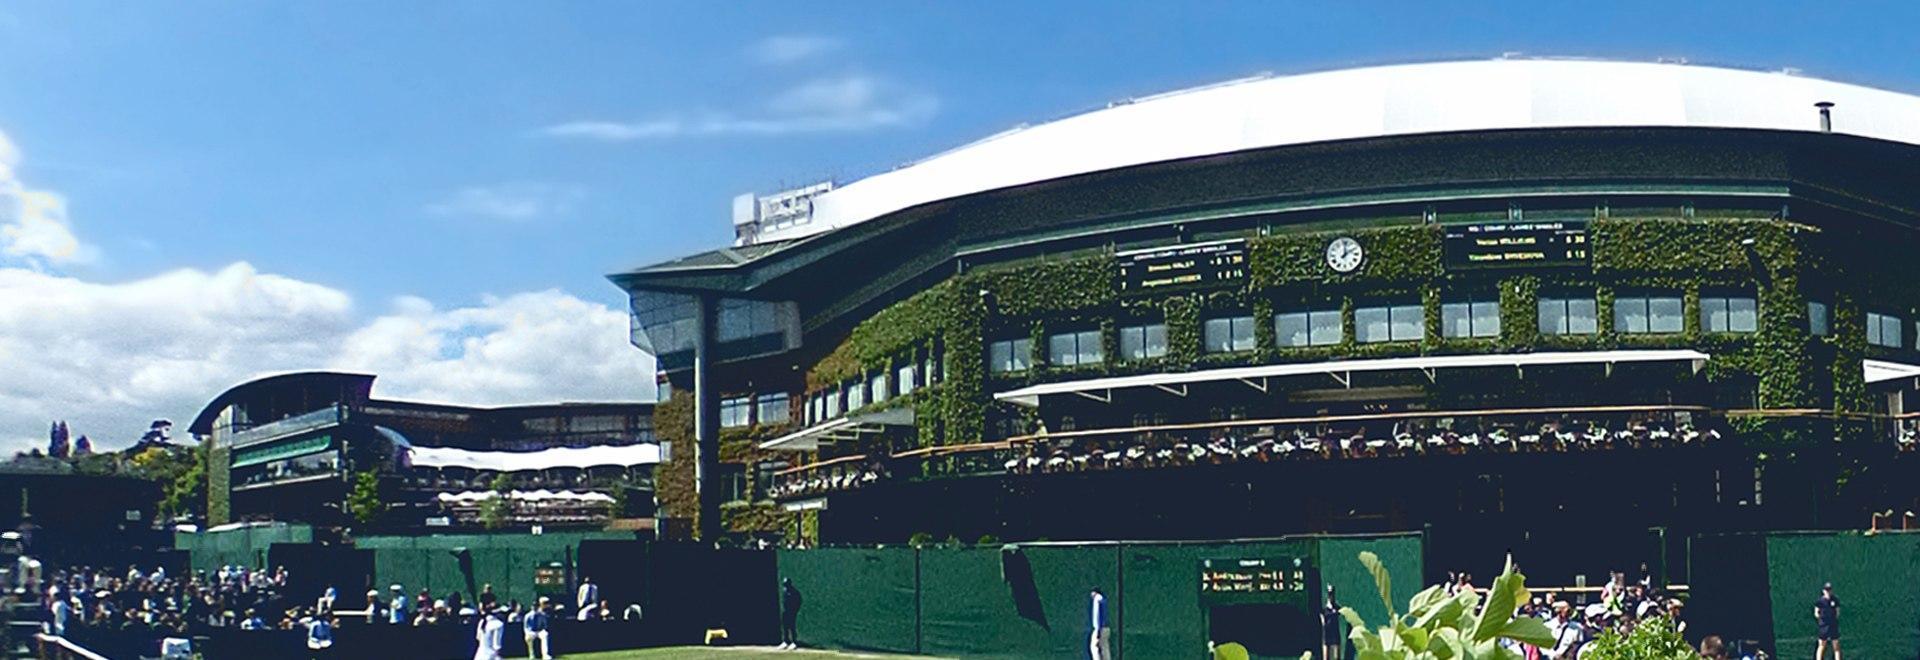 Wimbledon 2018: S. Williams - Giorgi. Quarti